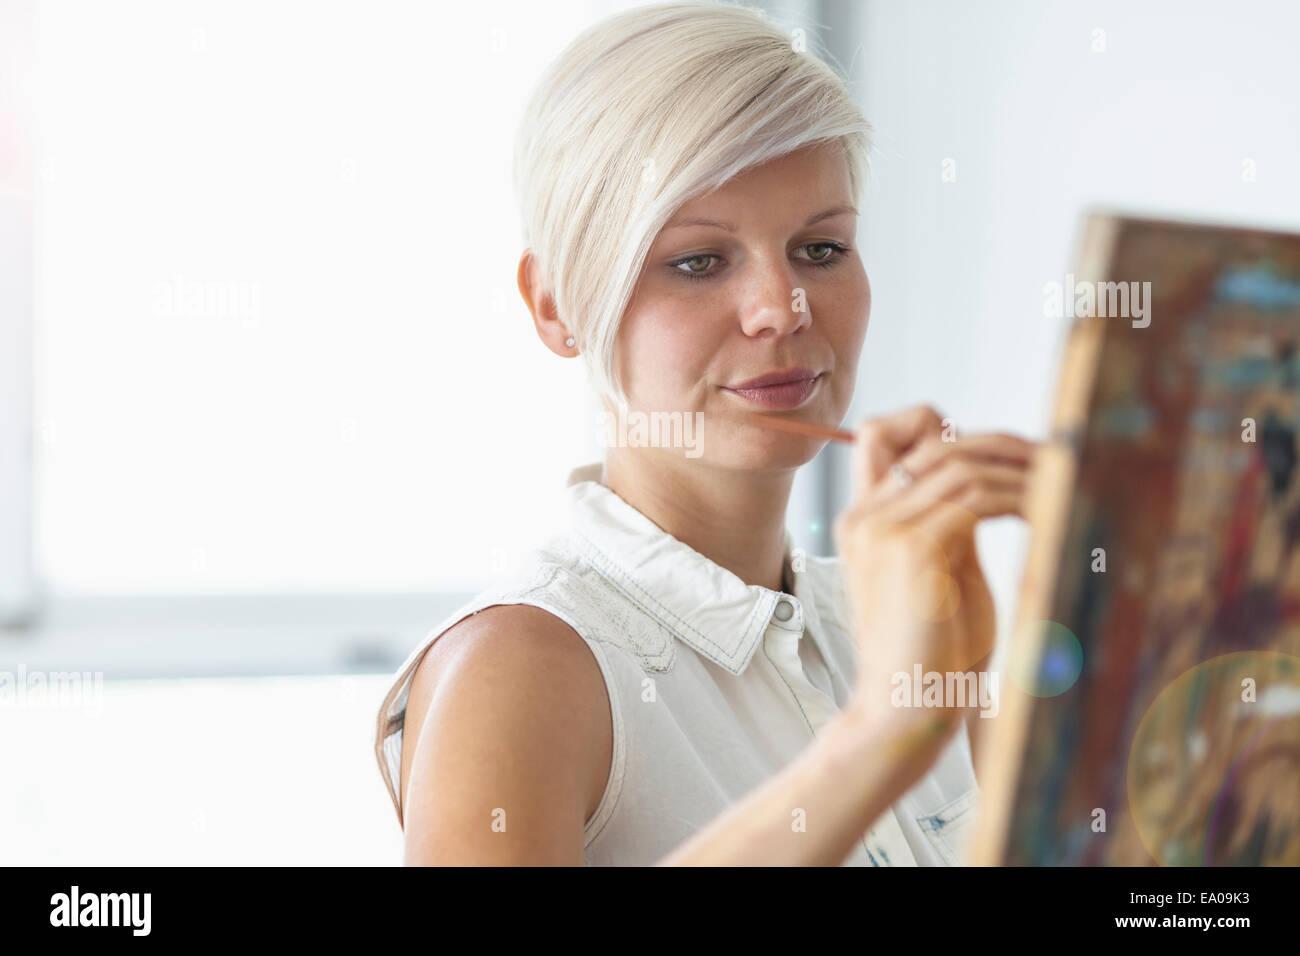 Weibliche Künstler malen an der Staffelei Stockbild